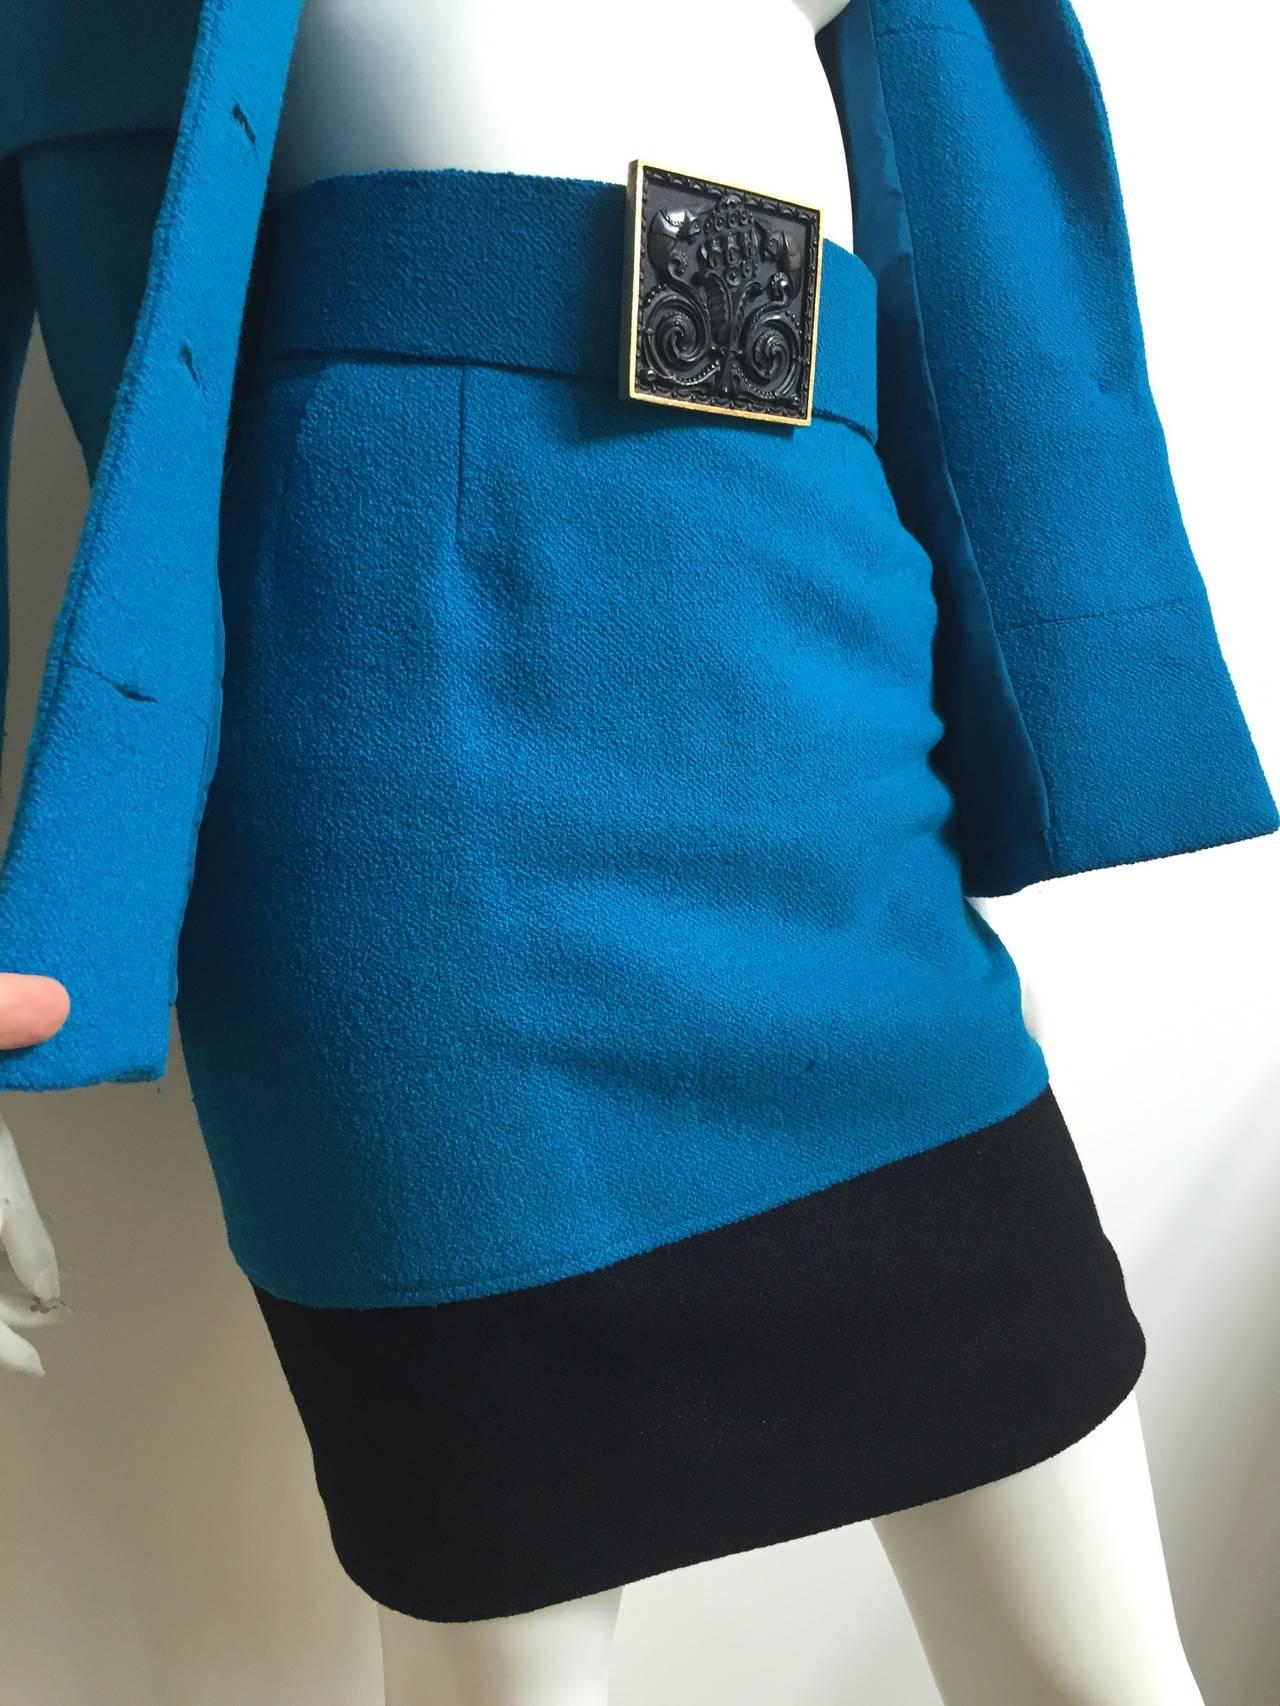 Karl Lagerfeld 80s Wool Skirt Suit Size 4. 4